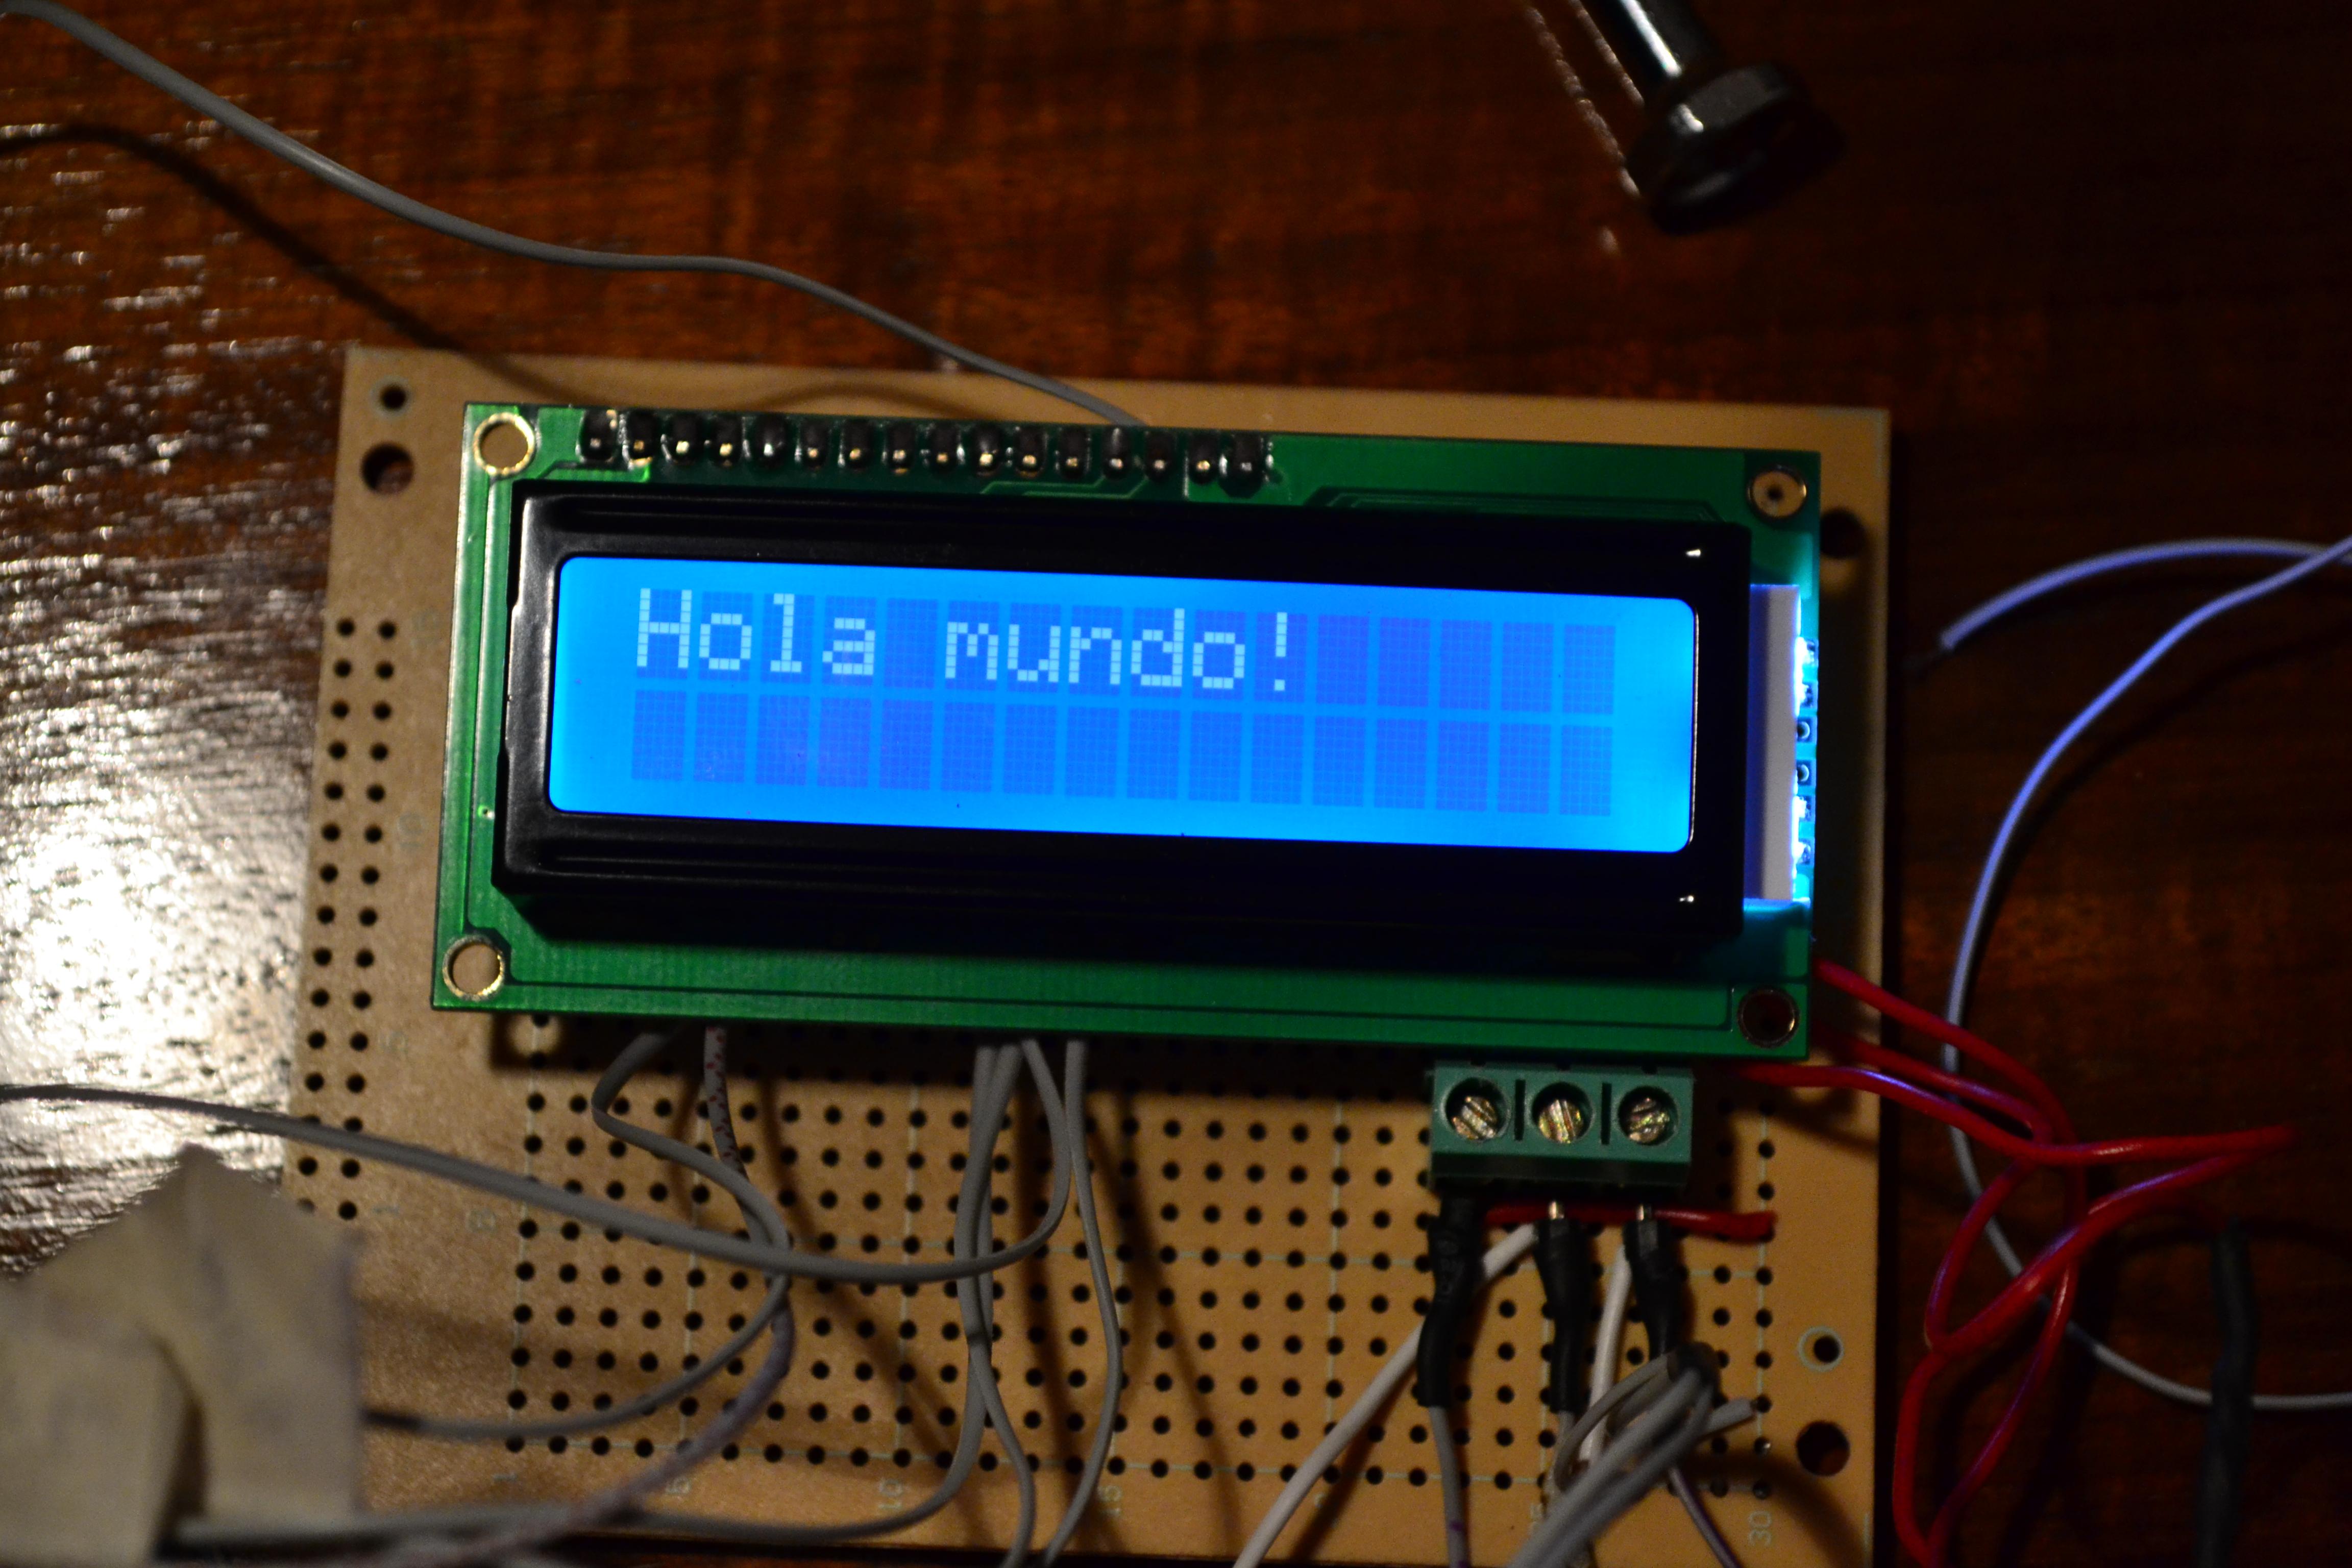 Arduinolab proyectos con arduino